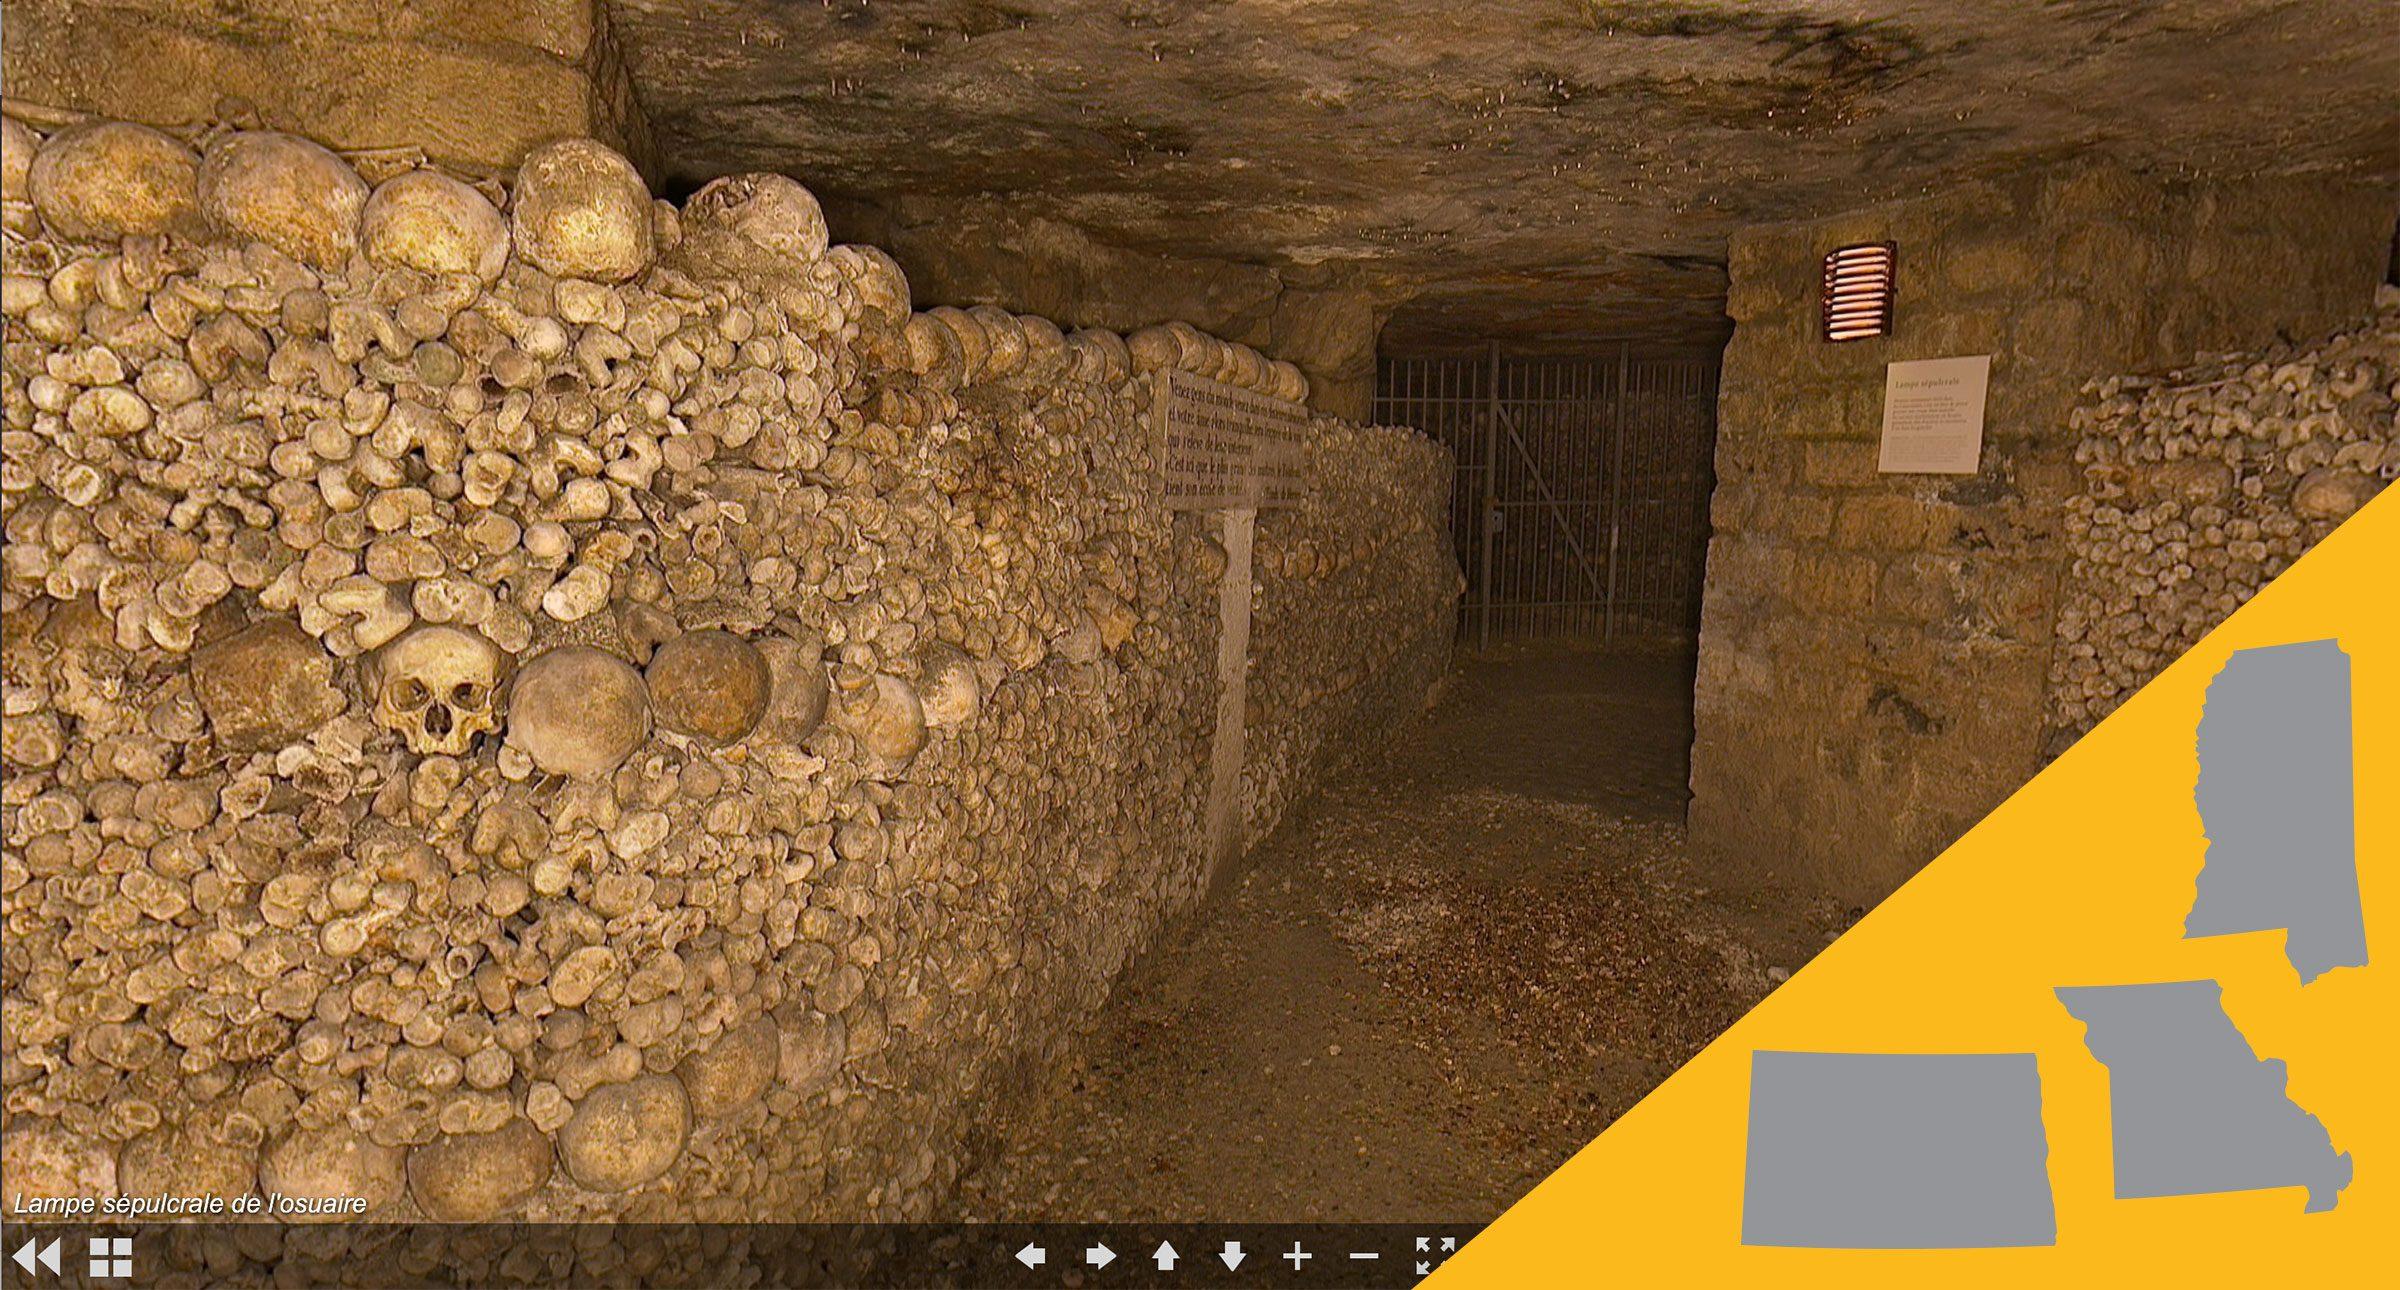 paris catacombes virtual tour